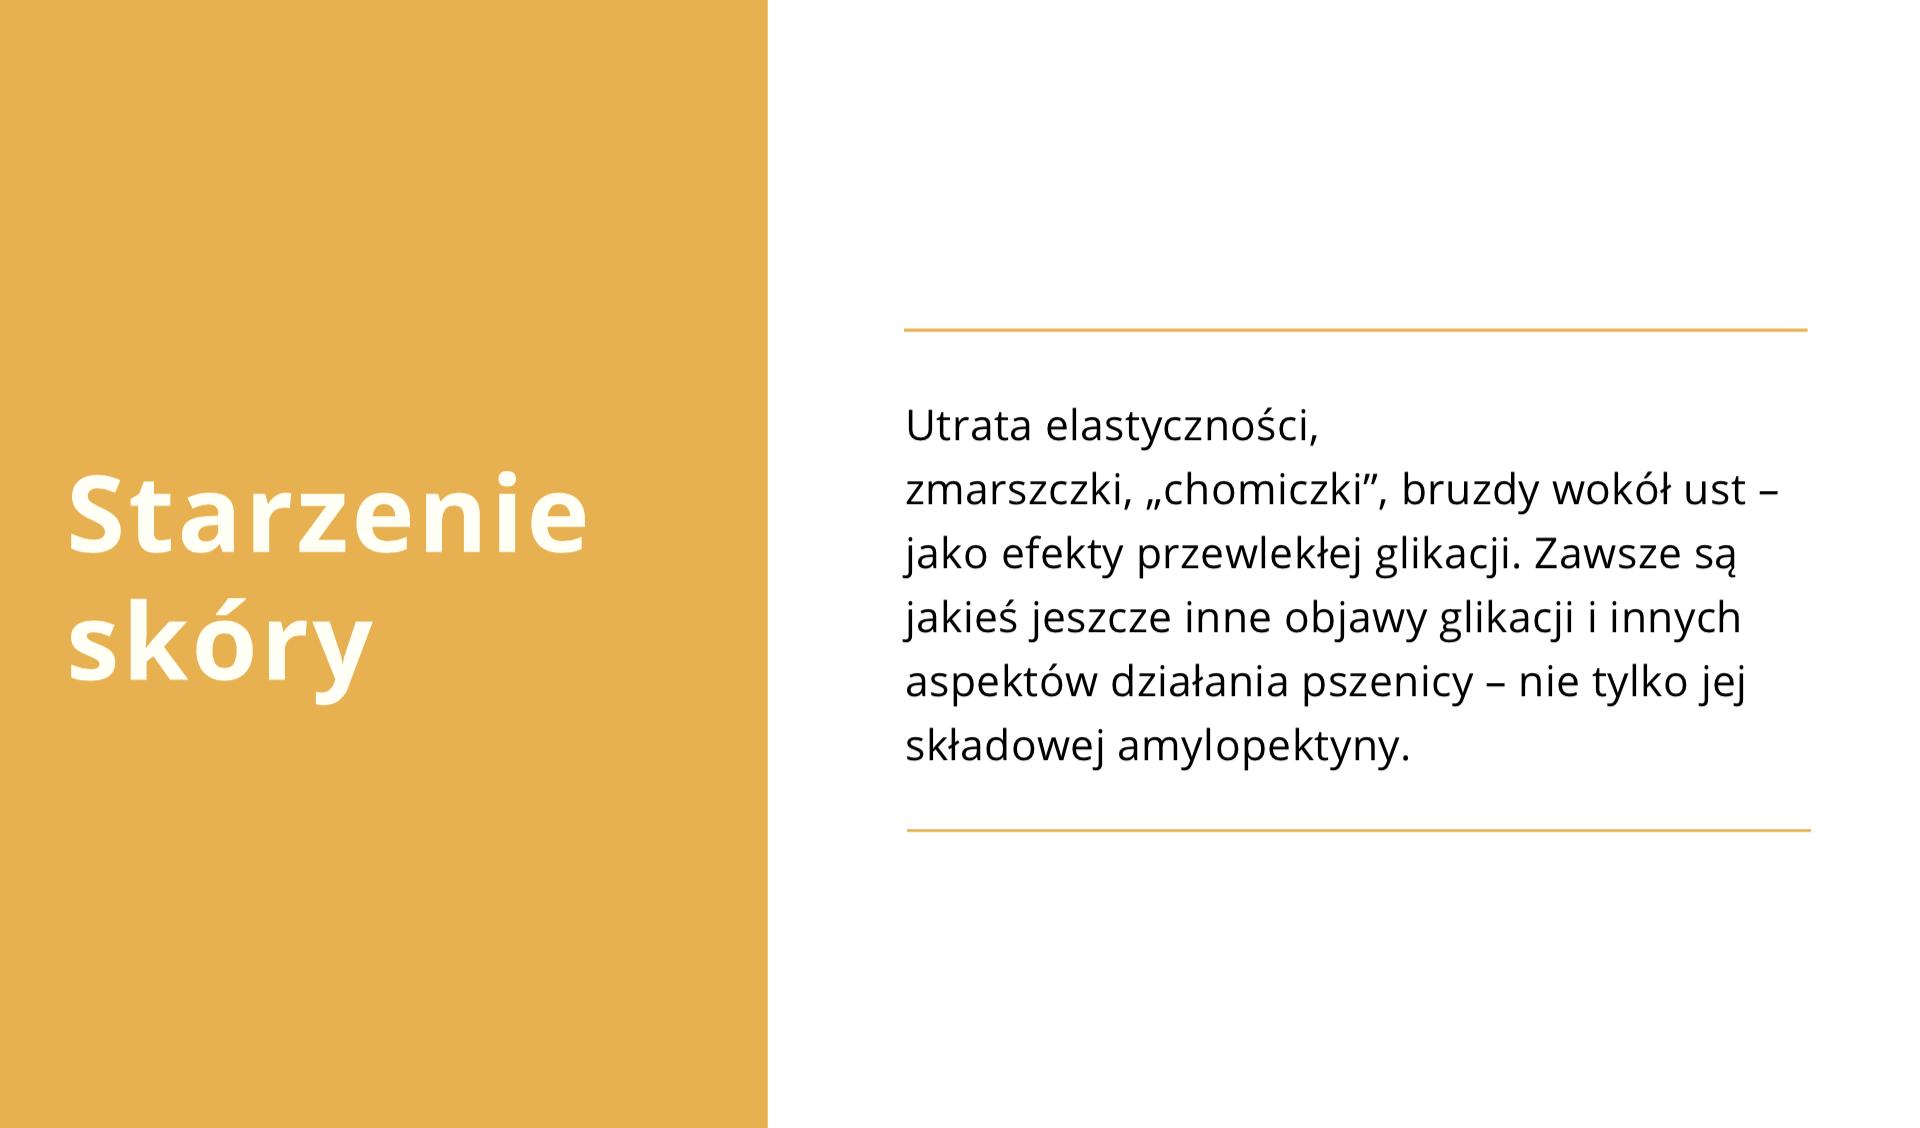 hipoalergiczni-dr-danuta-mylek-pszenica-20